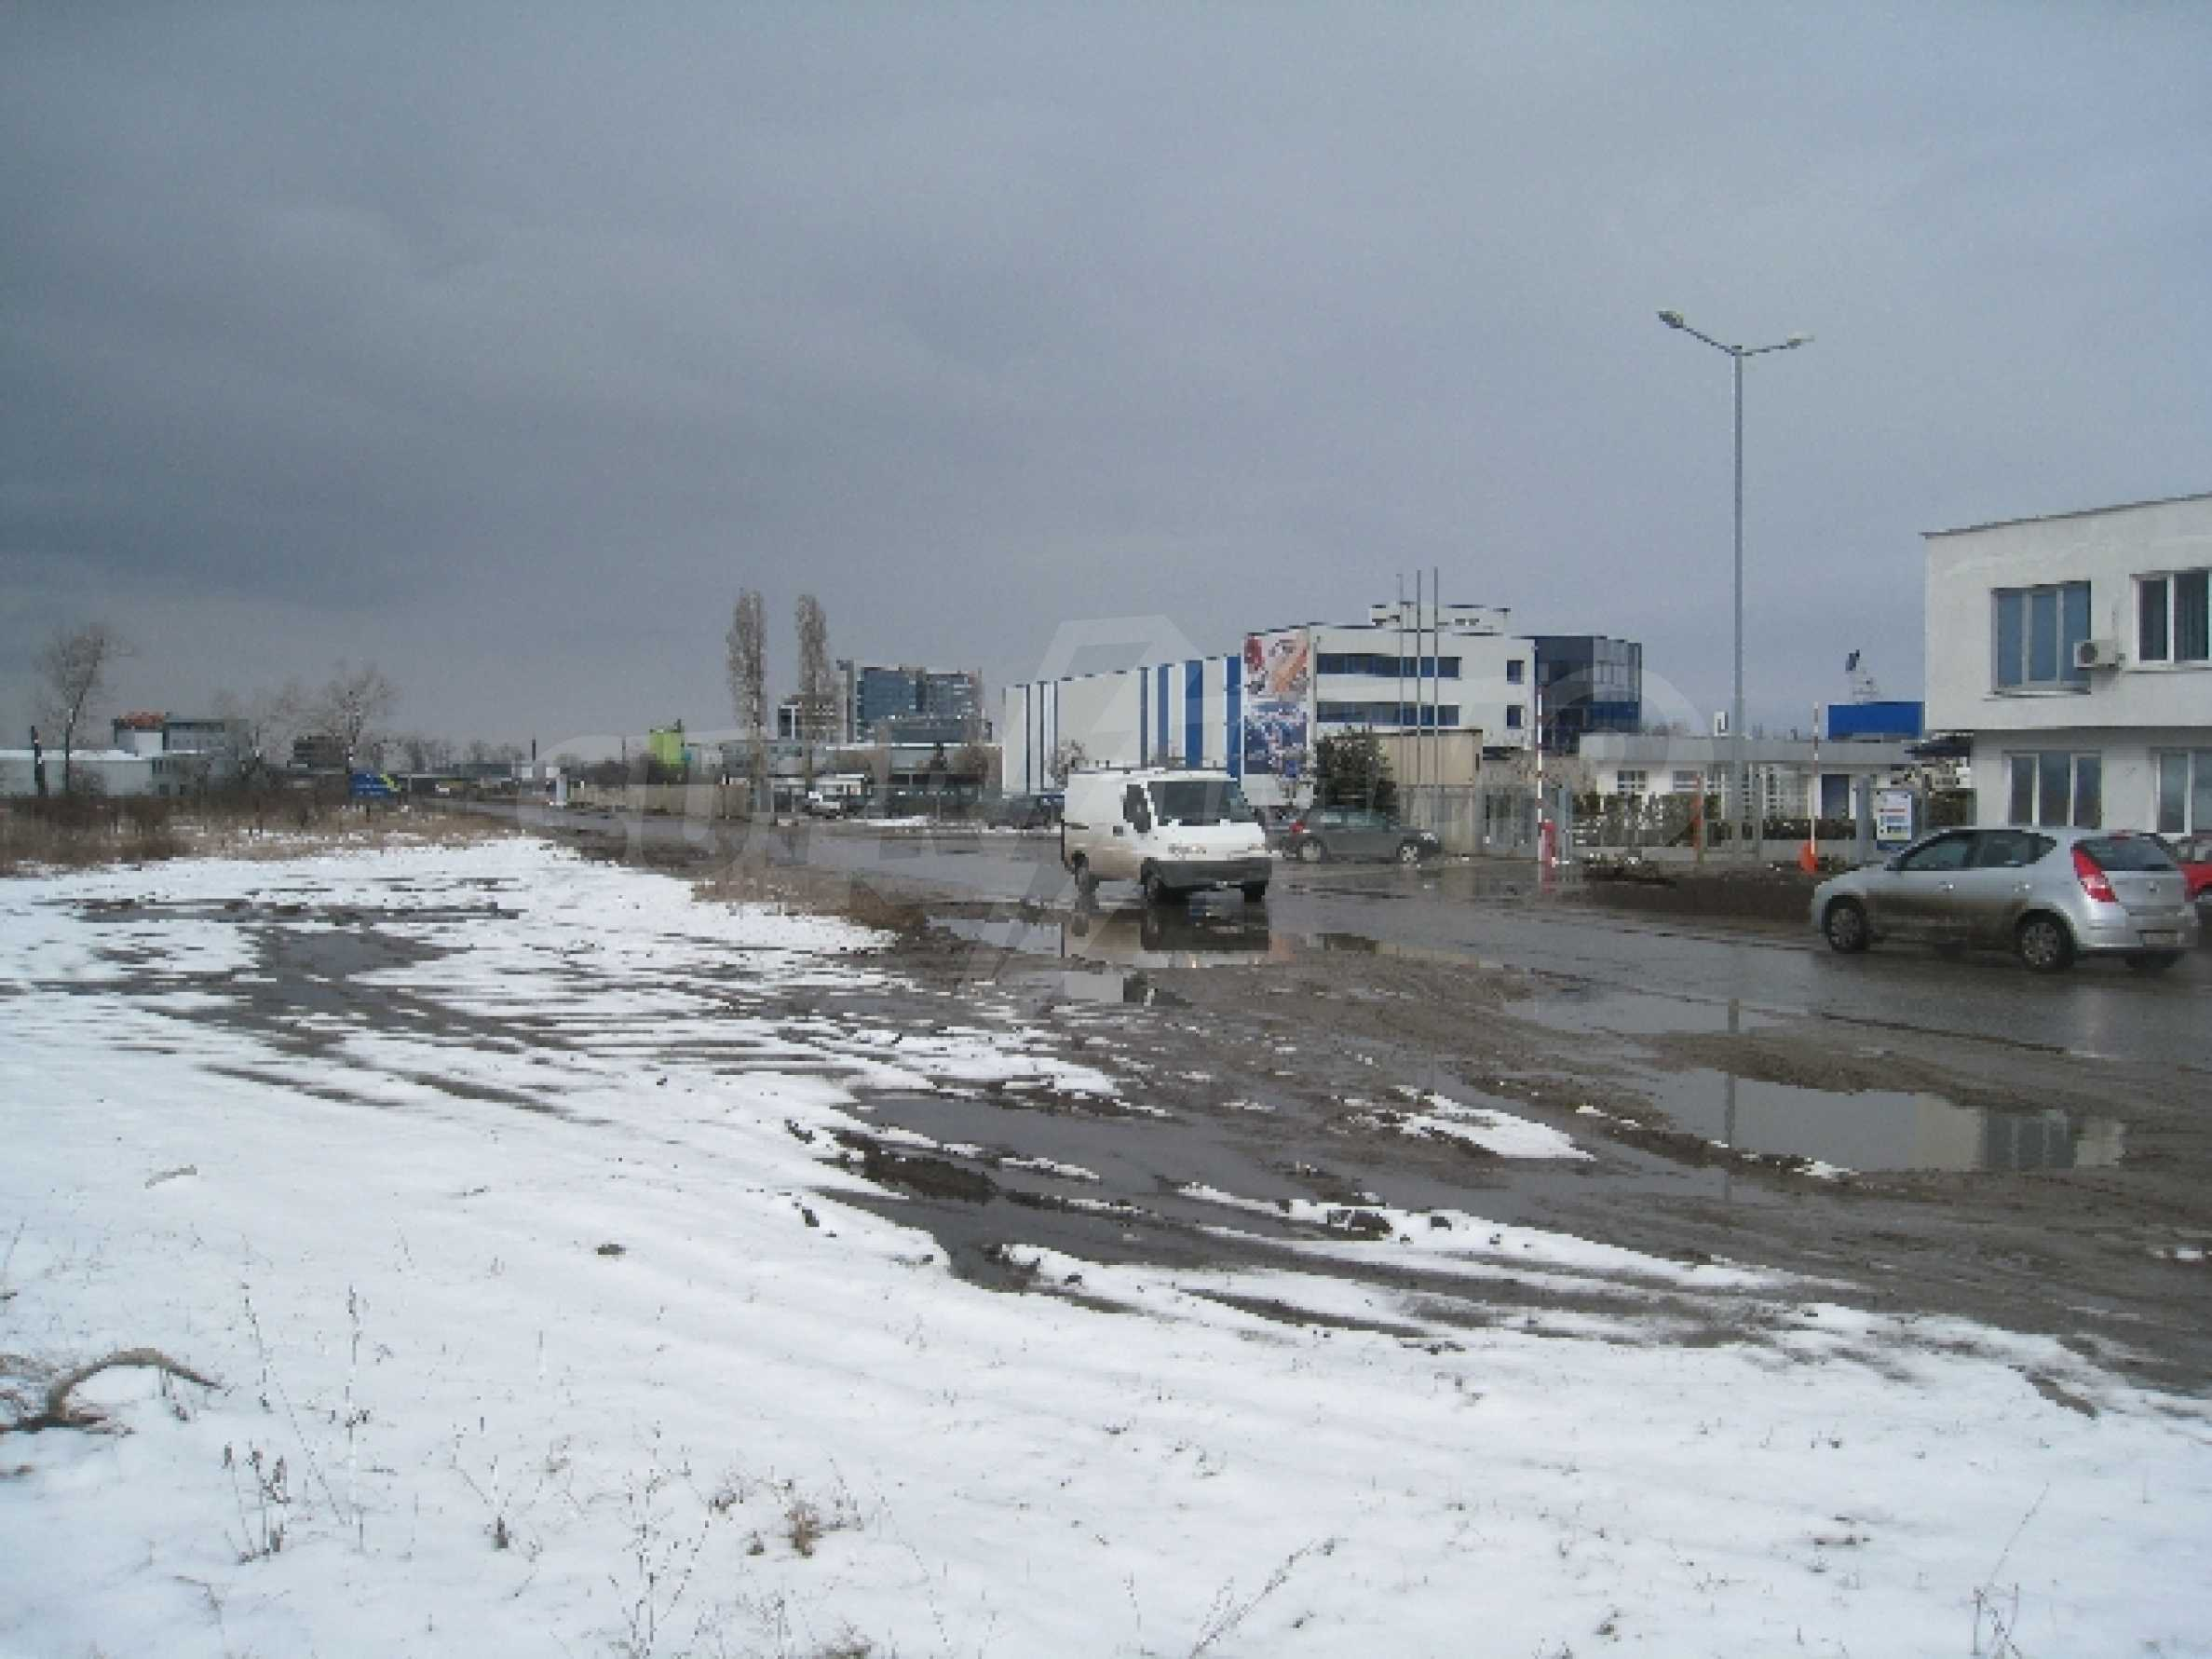 Baugrundstück neben dem Flughafen